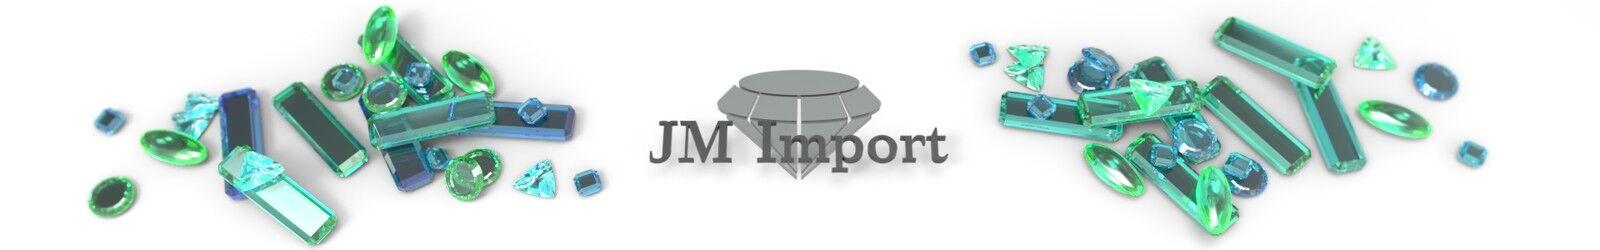 JM Import